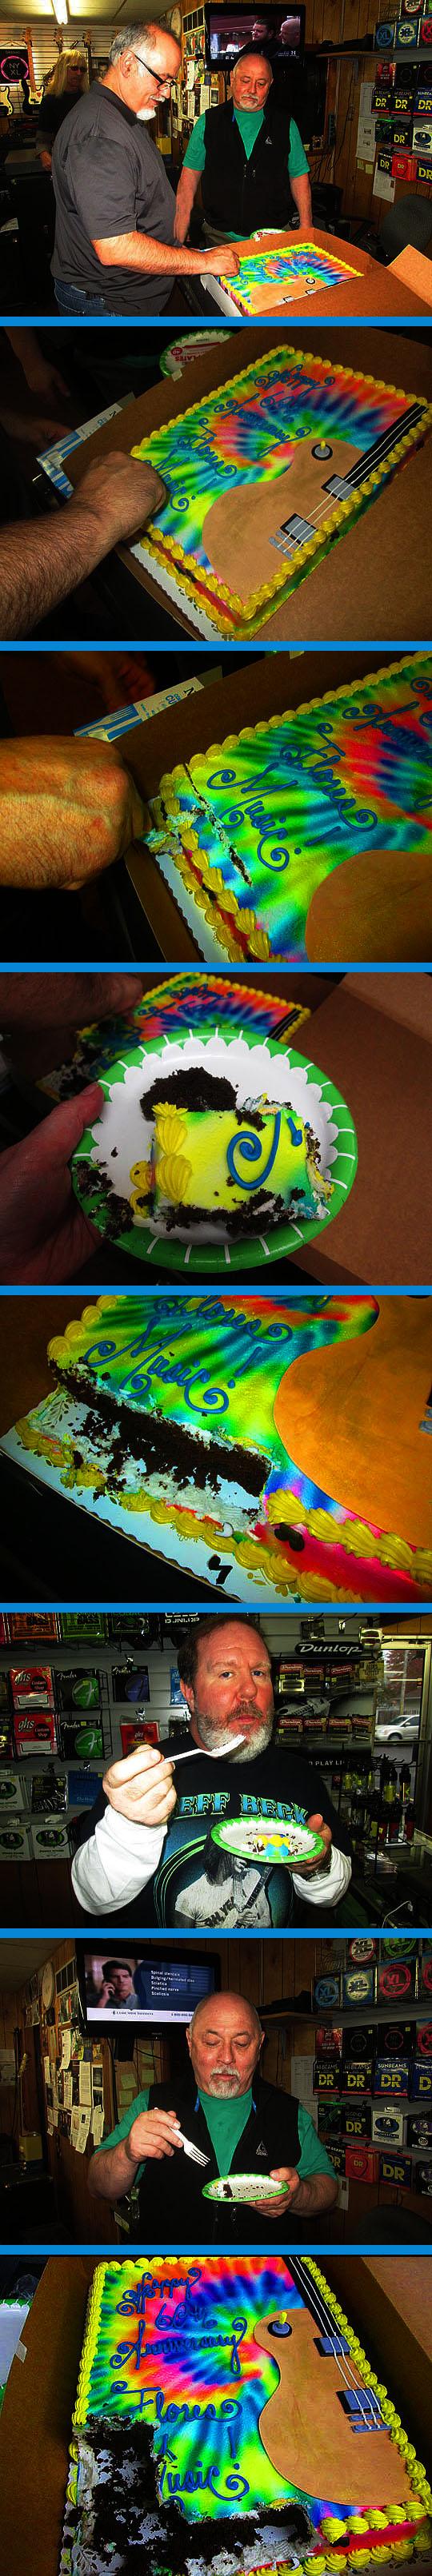 6. eatingcake_nov8-17.jpg